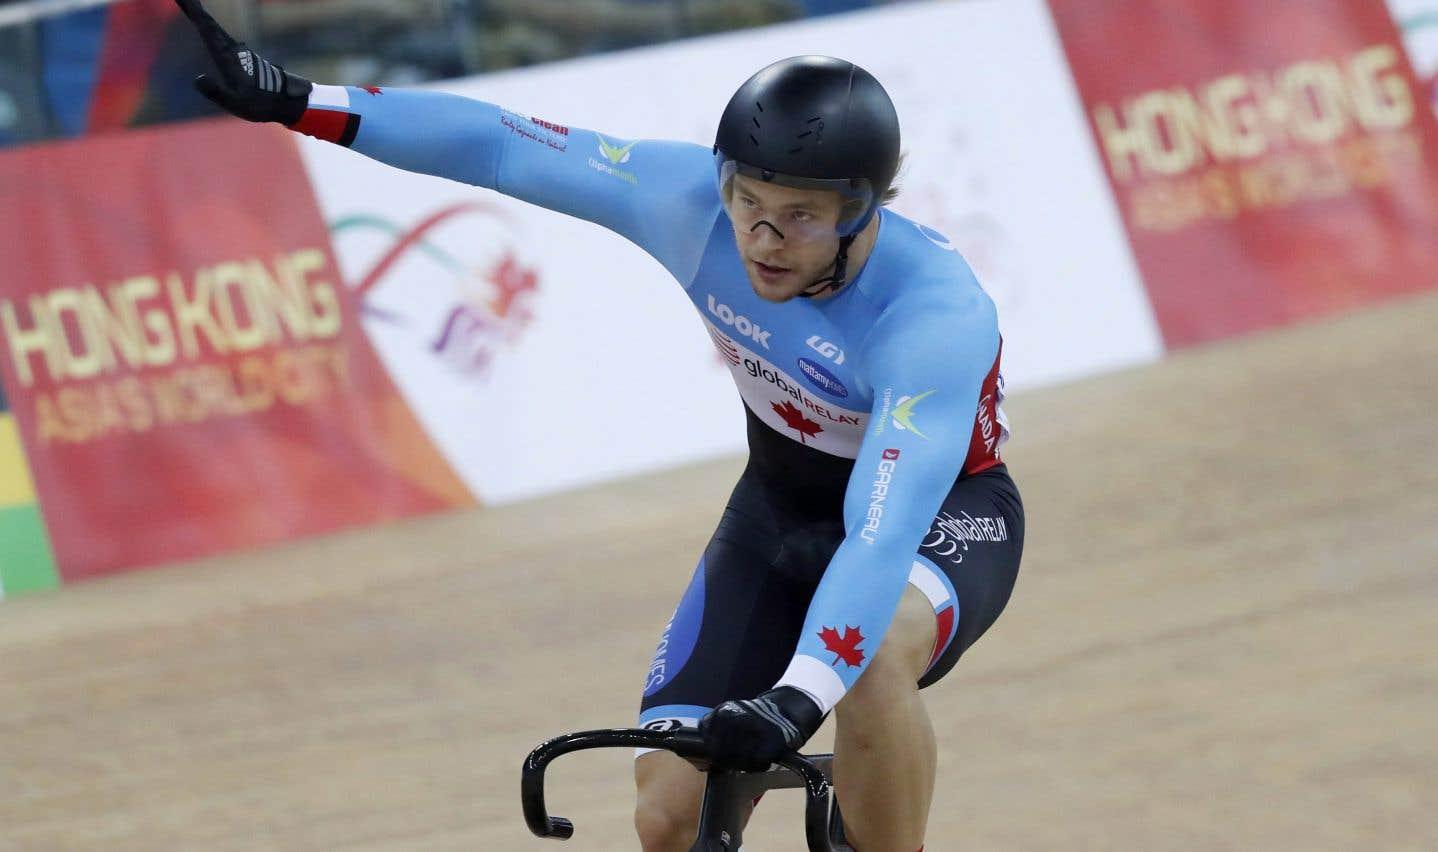 Le cycliste Hugo Barrette